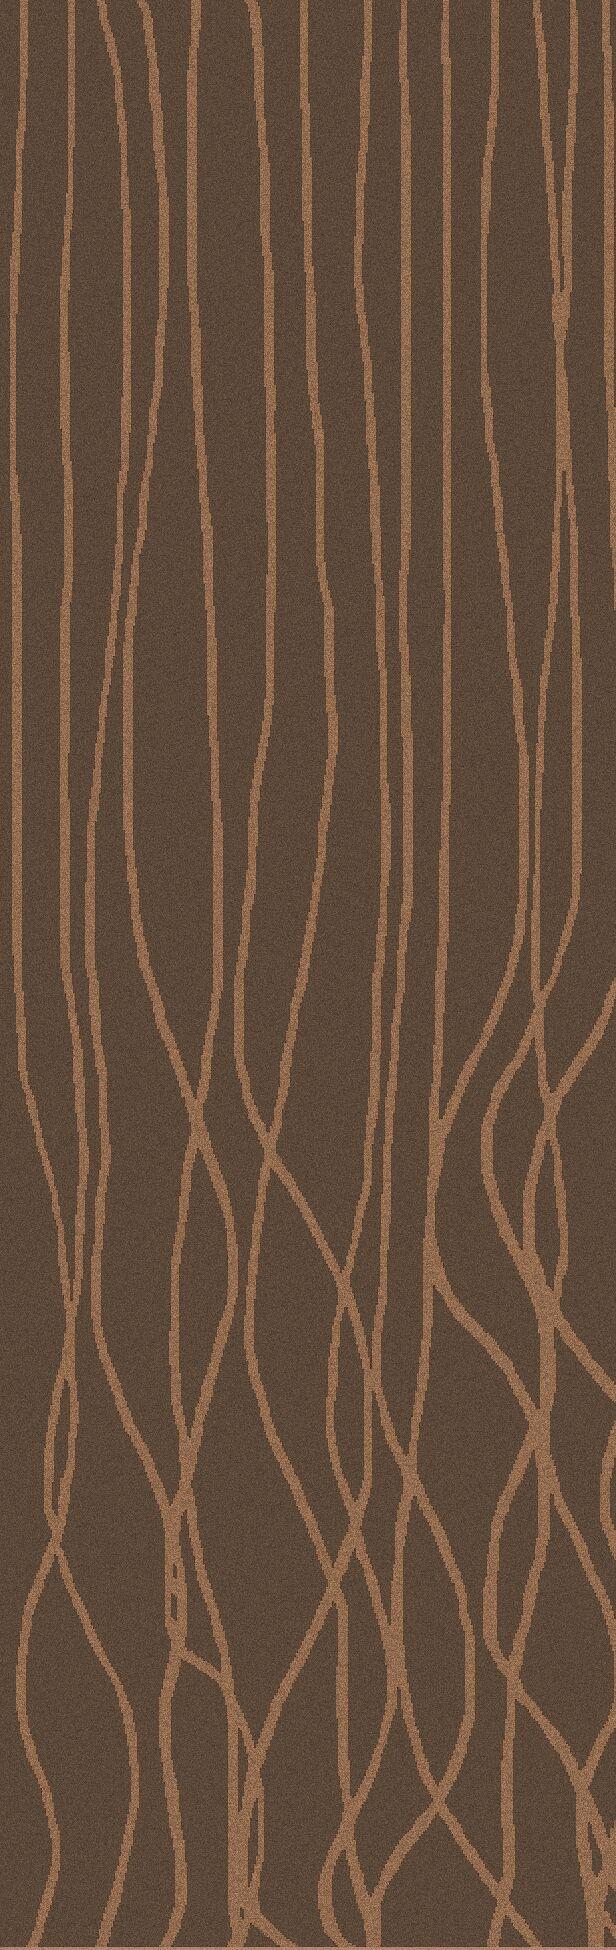 Romola Taupe Area Rug Rug Size: Rectangle 5' x 8'